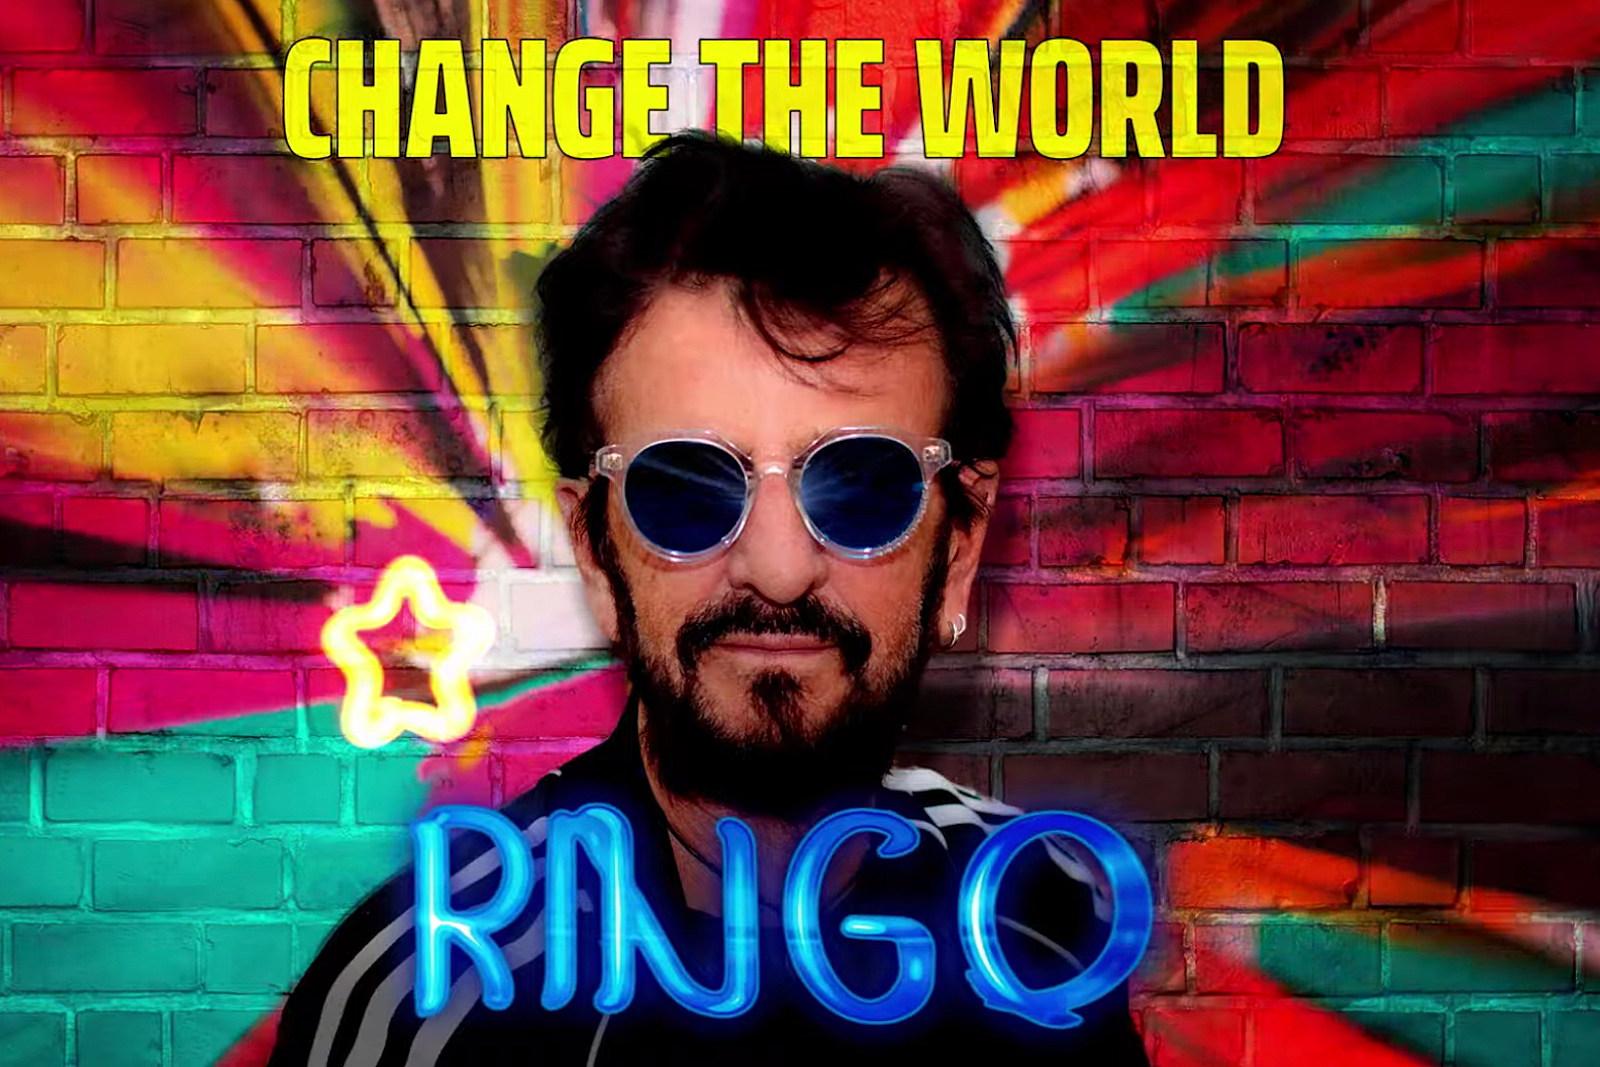 Ringo Starr Announces New EP, 'Change the World'